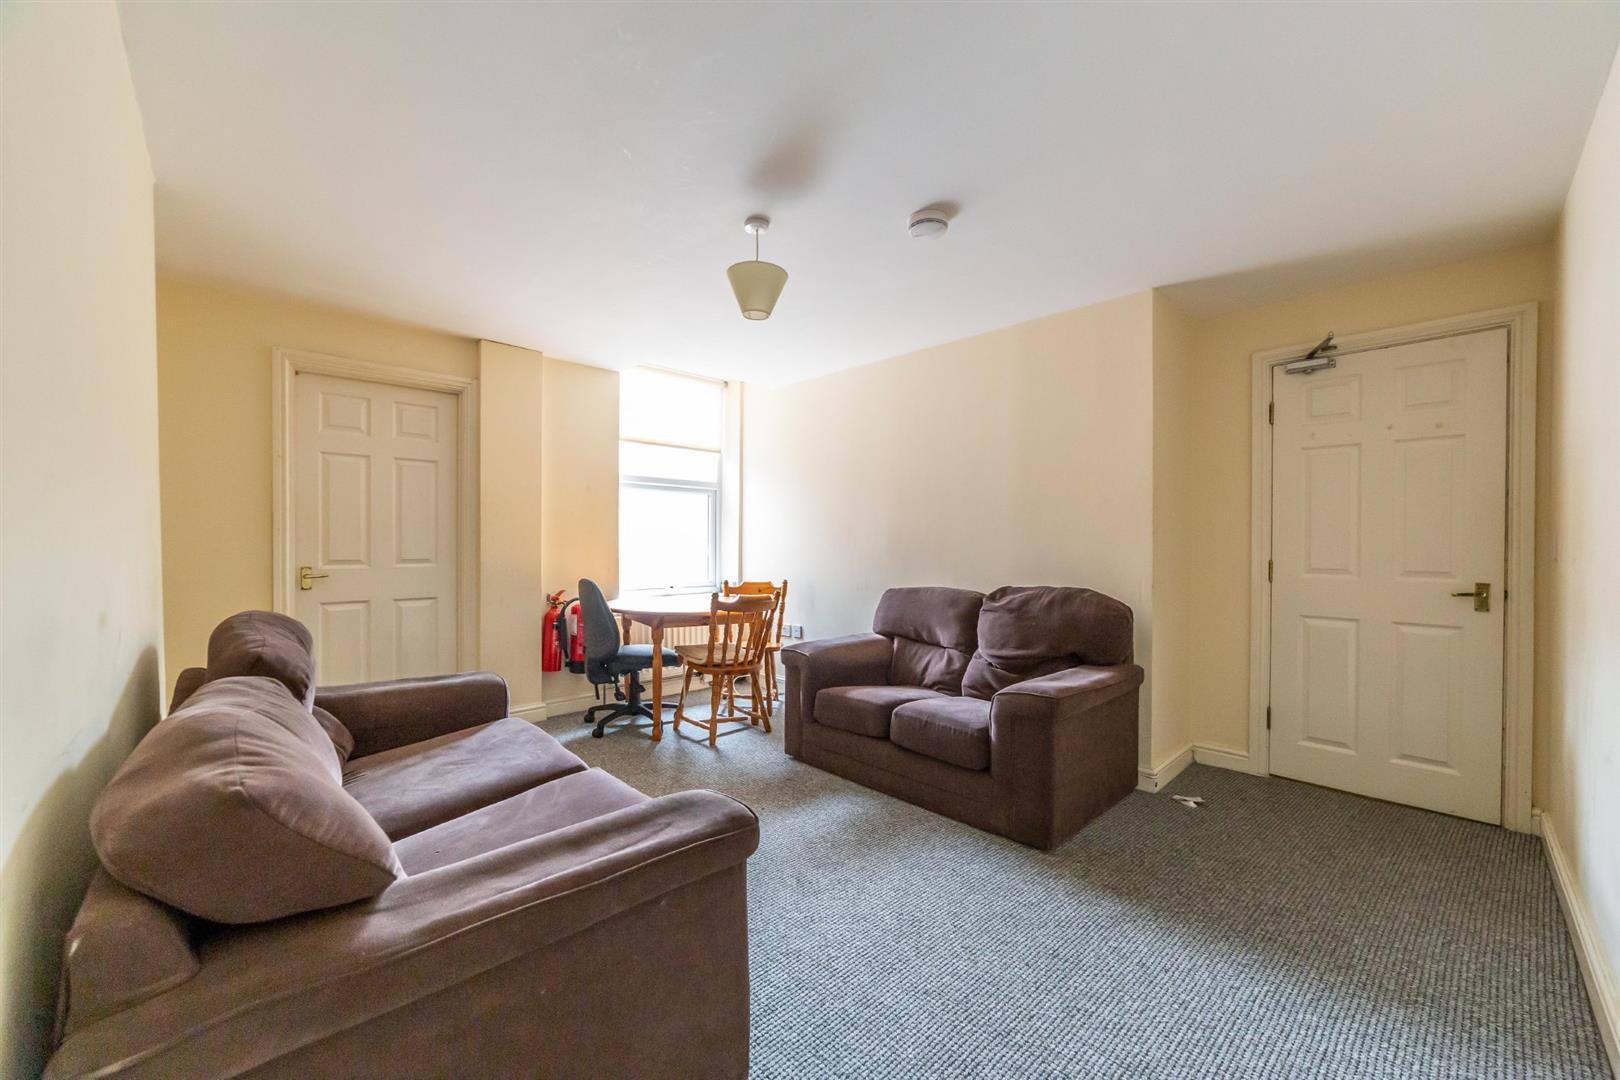 5 bed maisonette to rent in Newcastle Upon Tyne, NE6 5PP 0